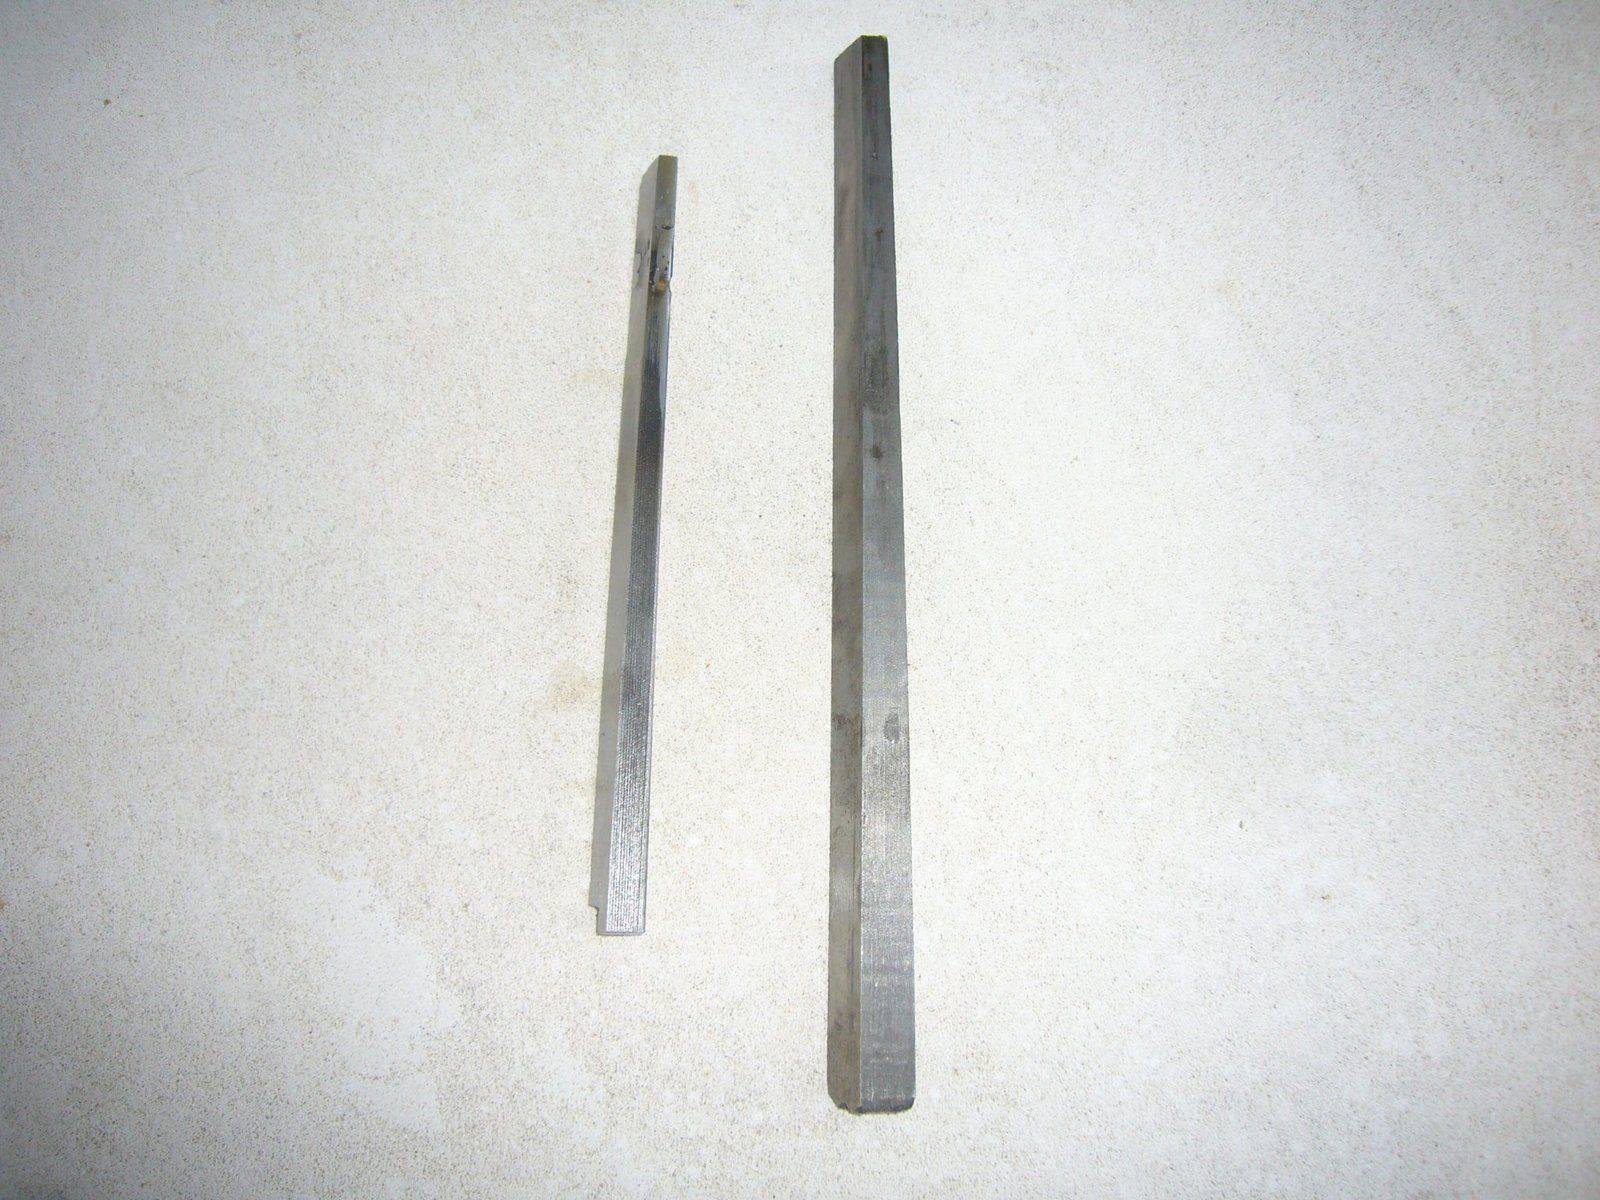 P1010783.JPG